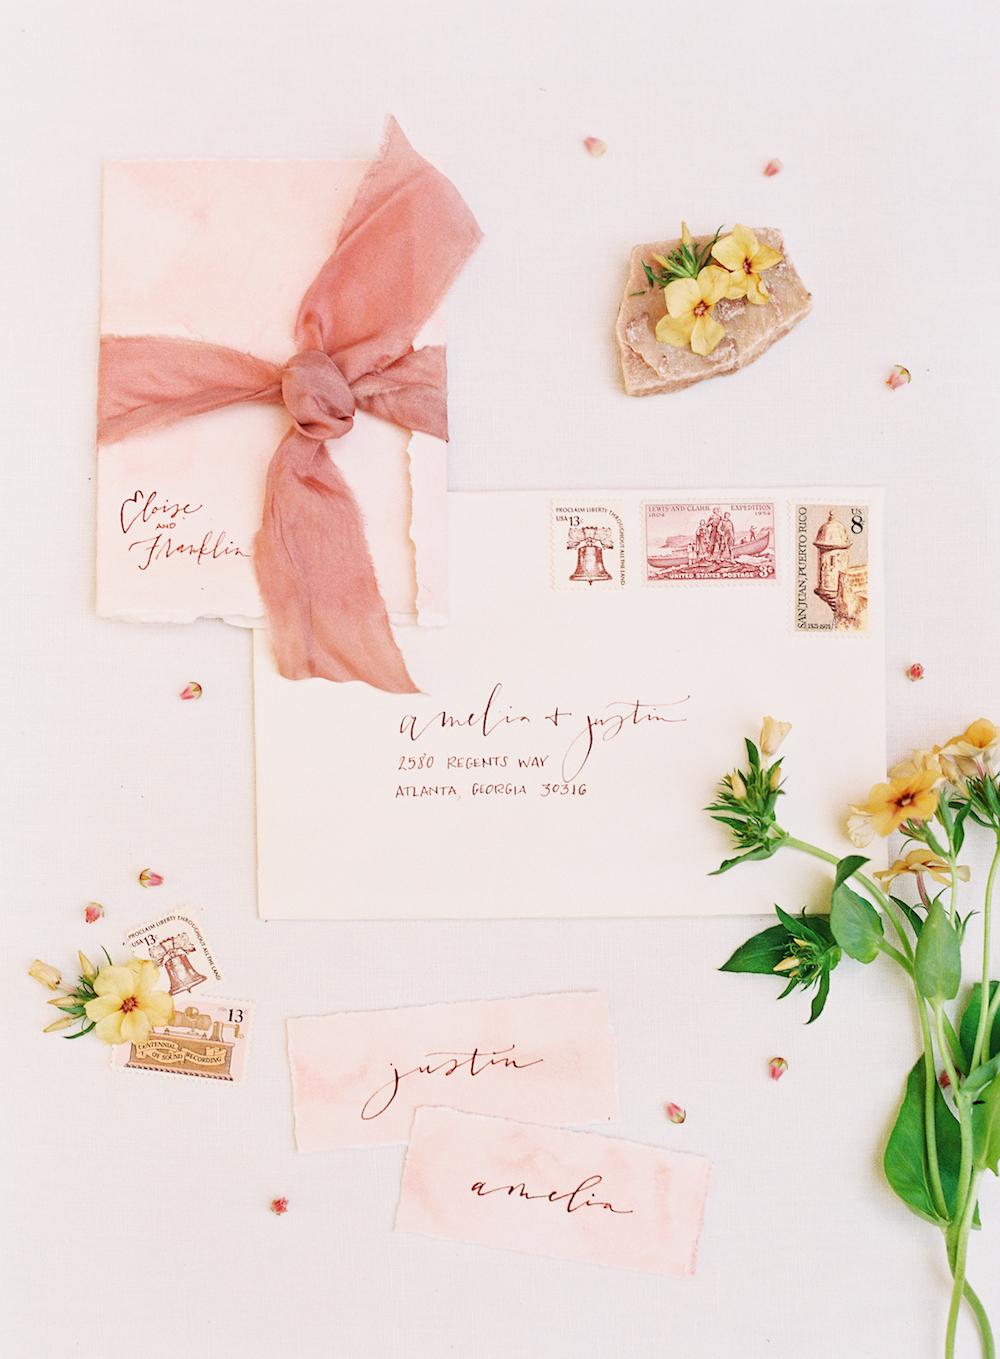 Organic Wedding Invitation Ideas - Calligraphy Wedding